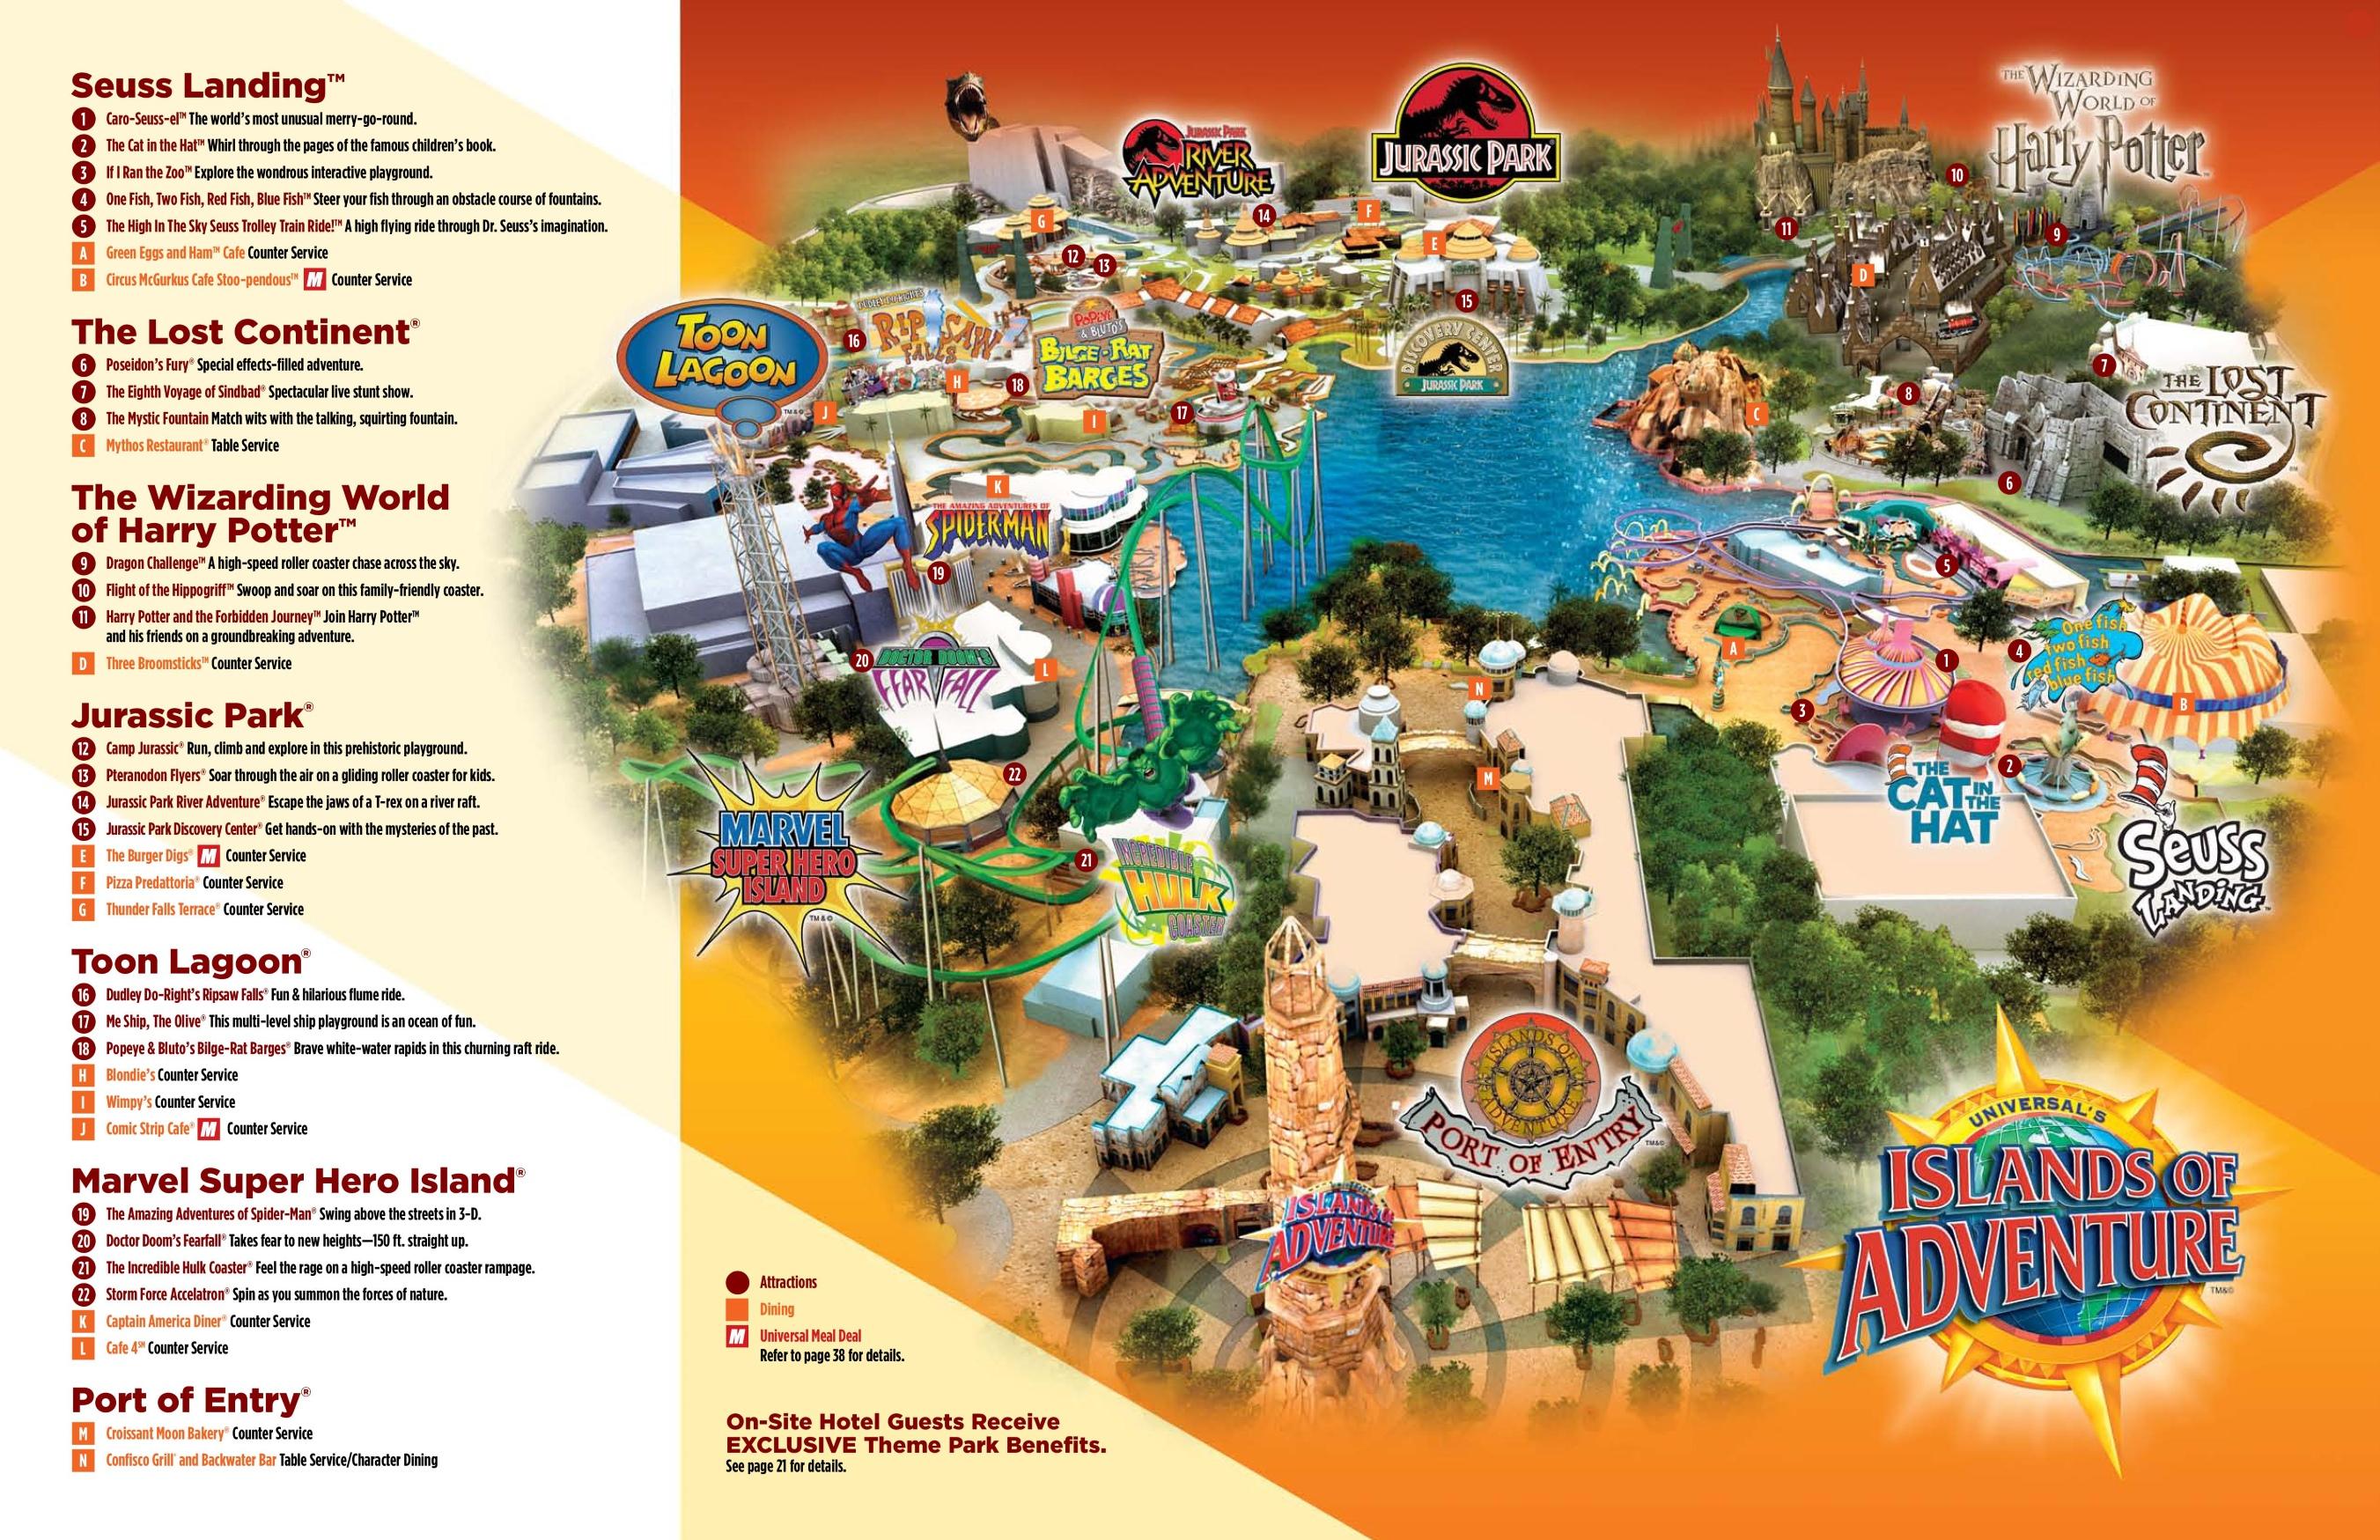 Adventure Island Orlando Map Orlando Islands of Adventure map